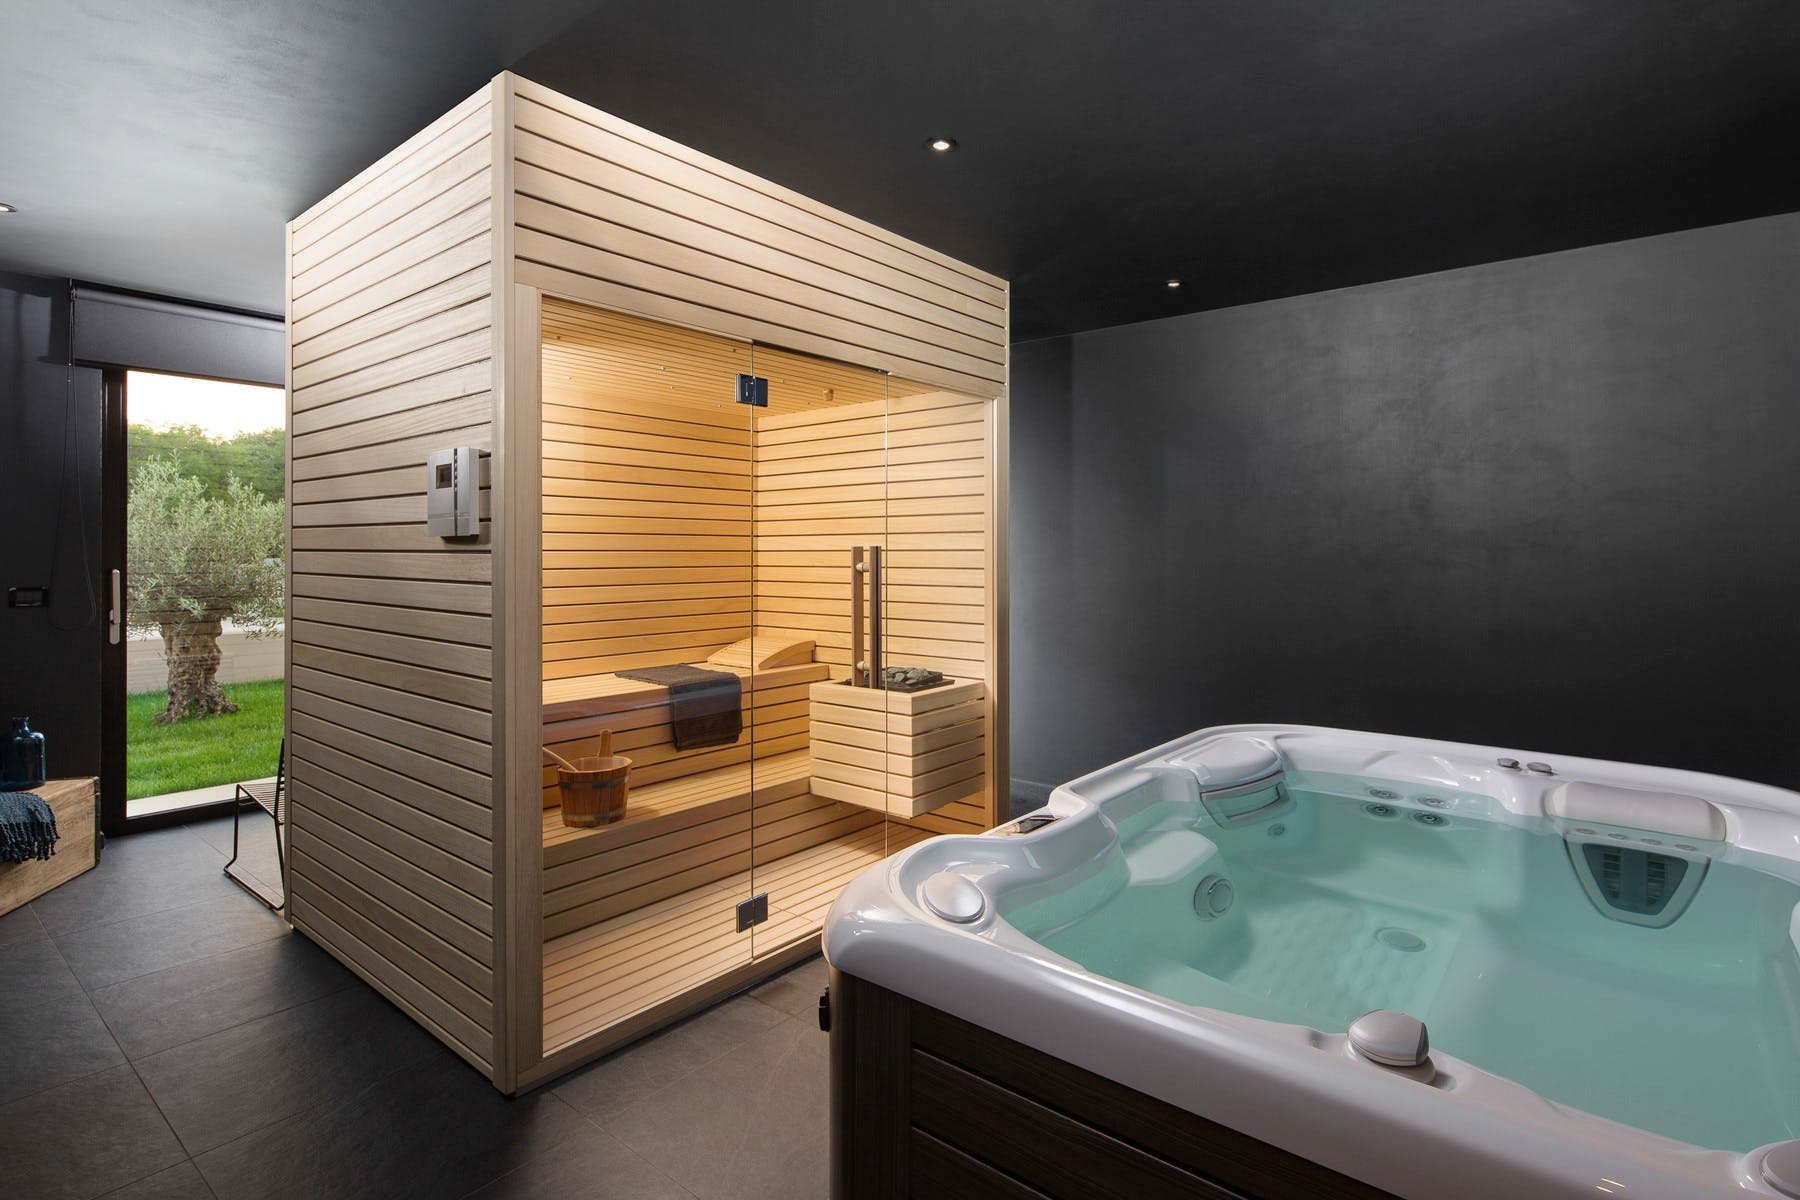 Spa area with jacuzzi and sauna